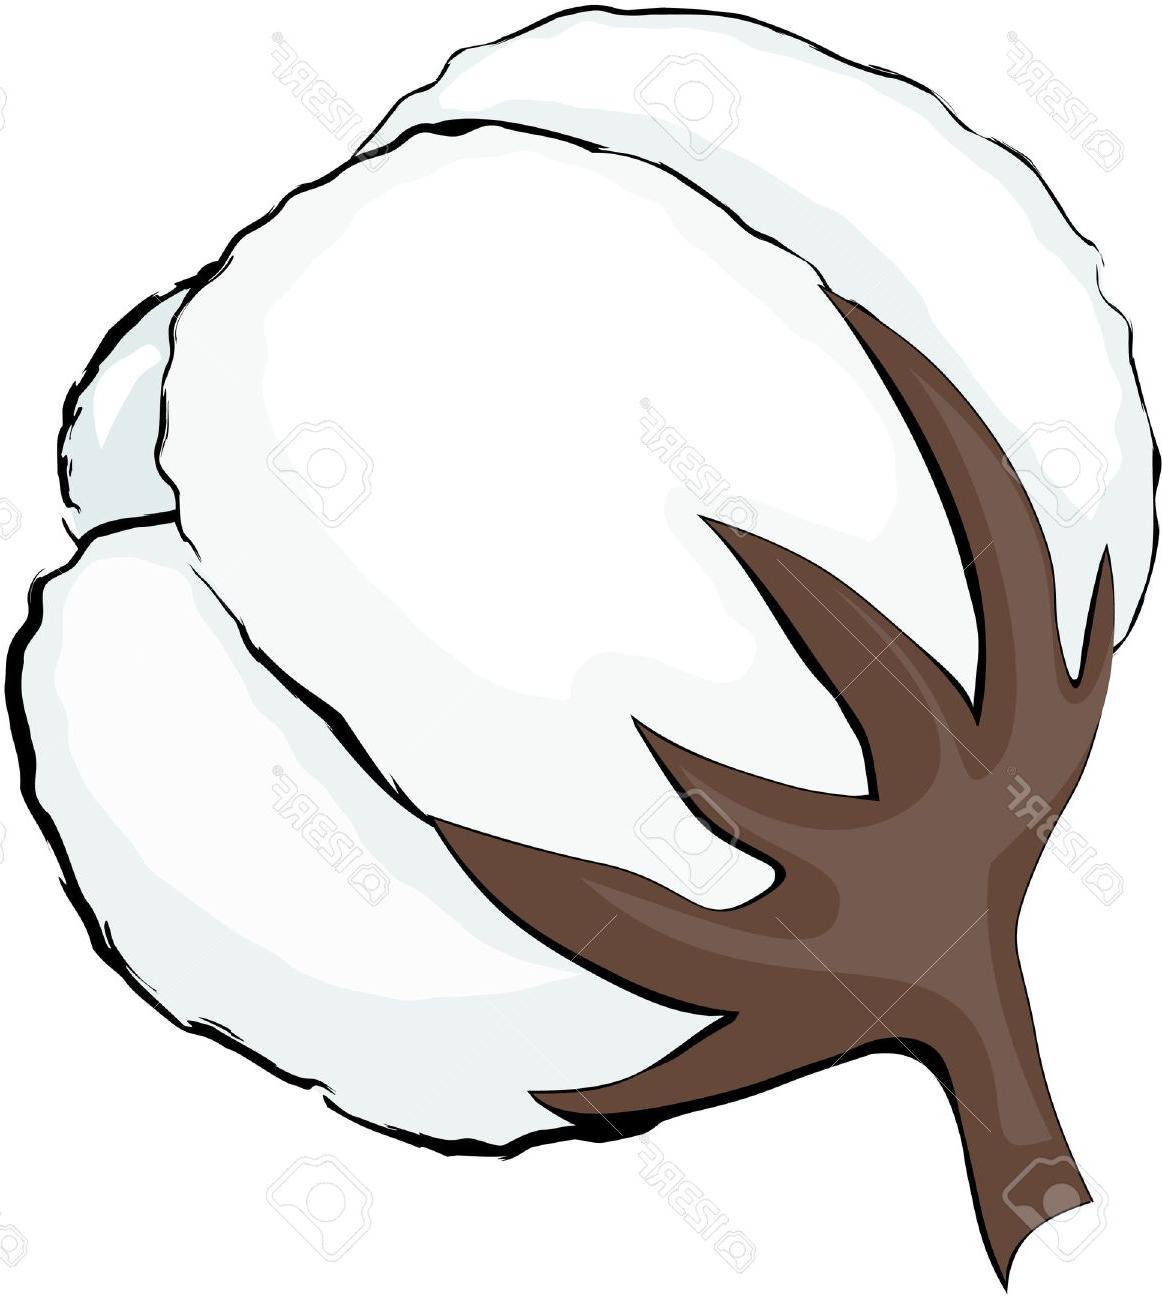 Hd logo clip art. Cotton clipart